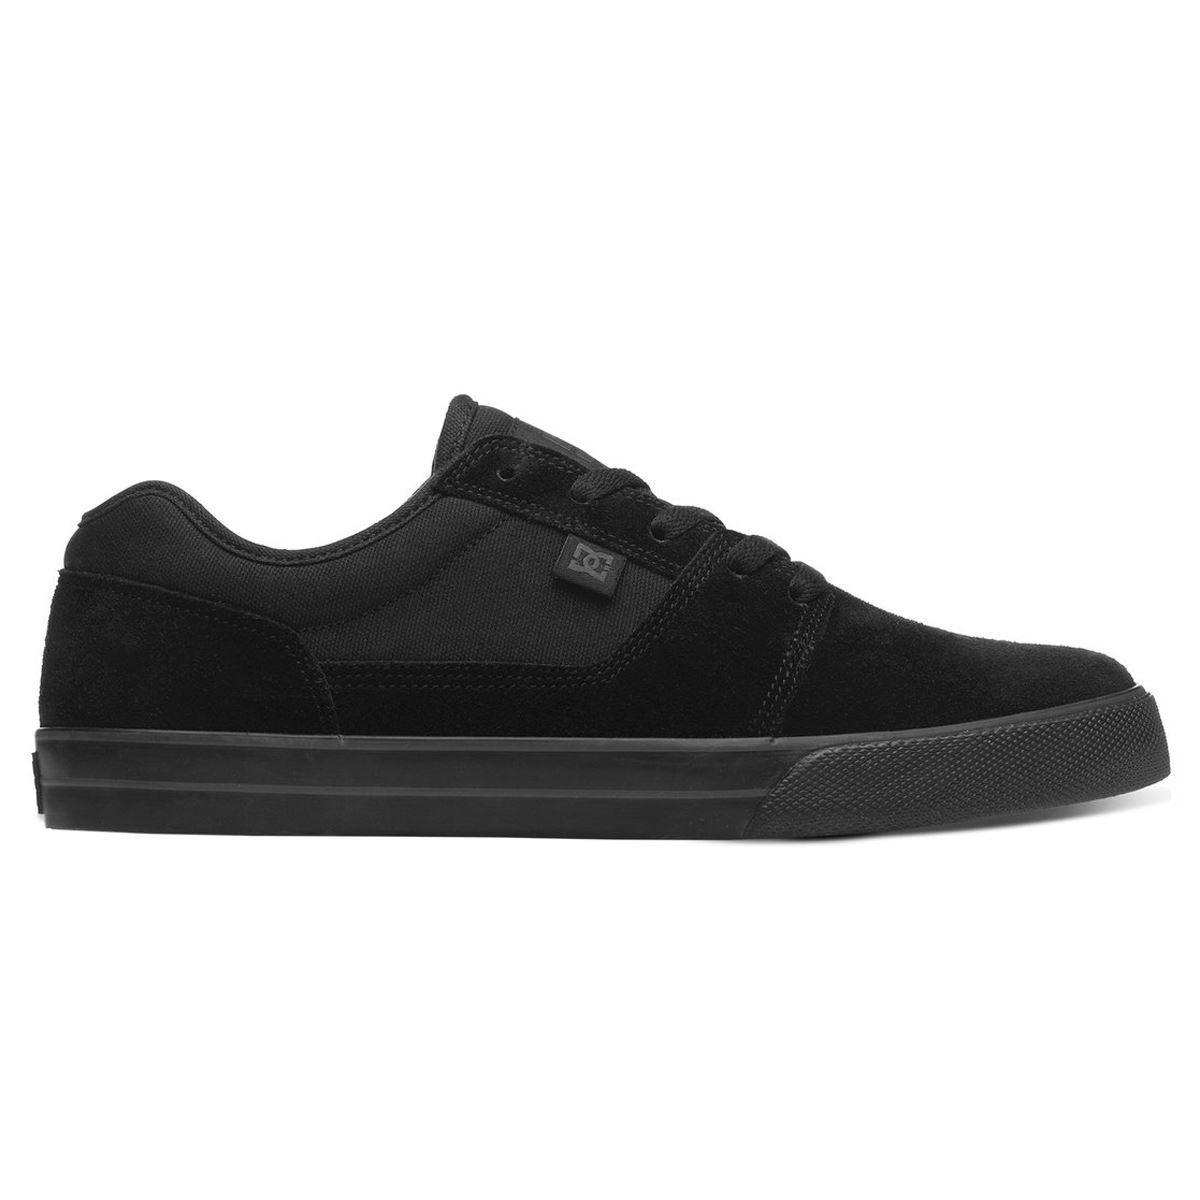 DC Shoes Tonic Black Mens Trainers